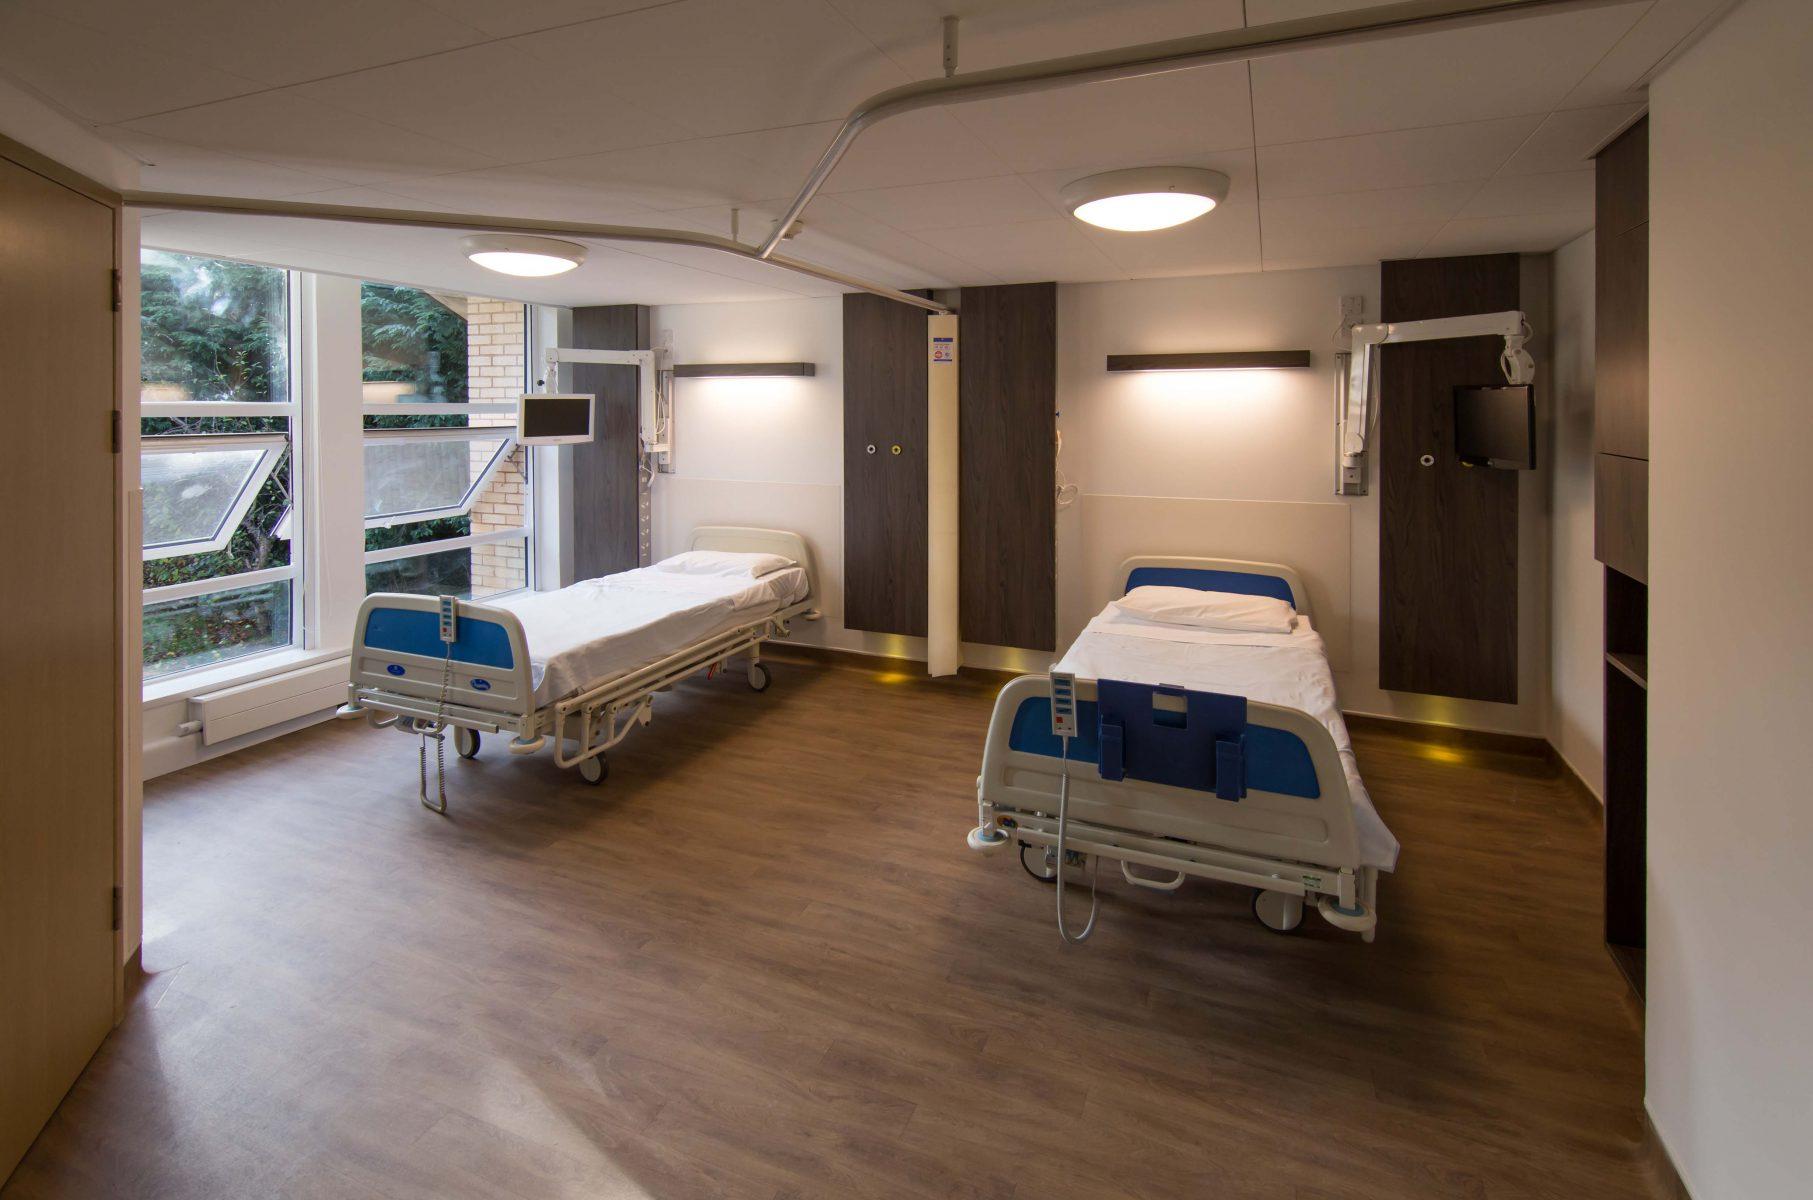 LiP Medical Firenze Unit 2